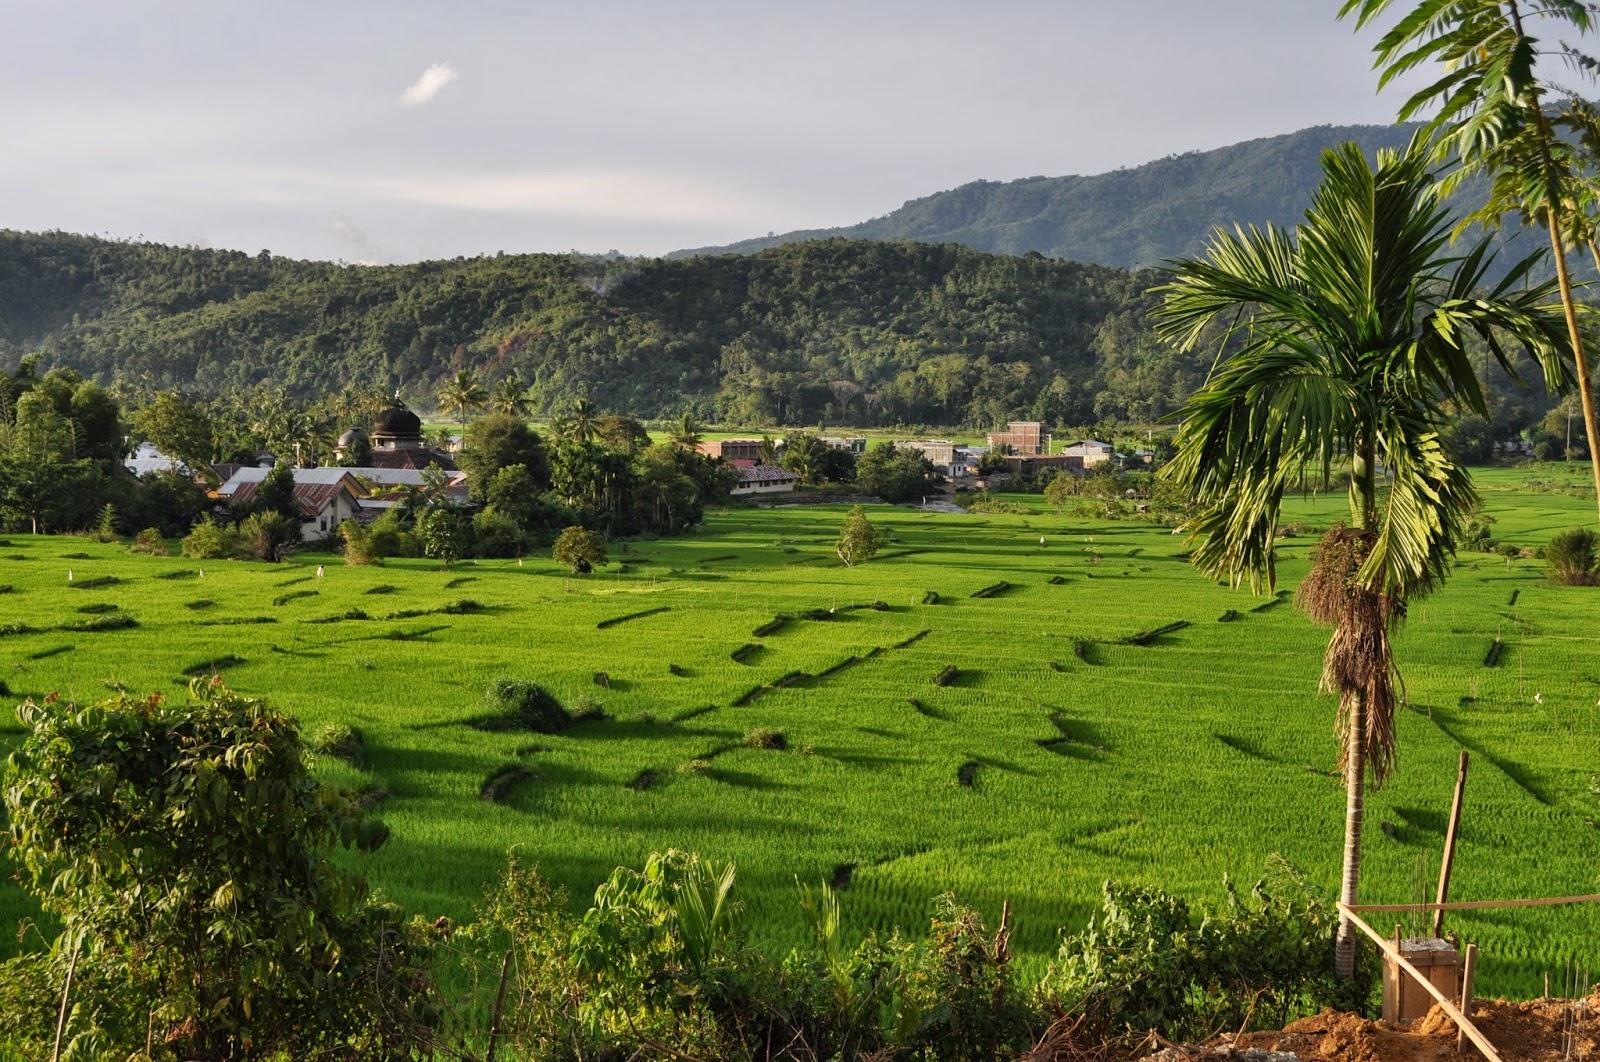 Siapa Sebenarnya Pencipta Lagu Aceh Tanoh Lon Sayang